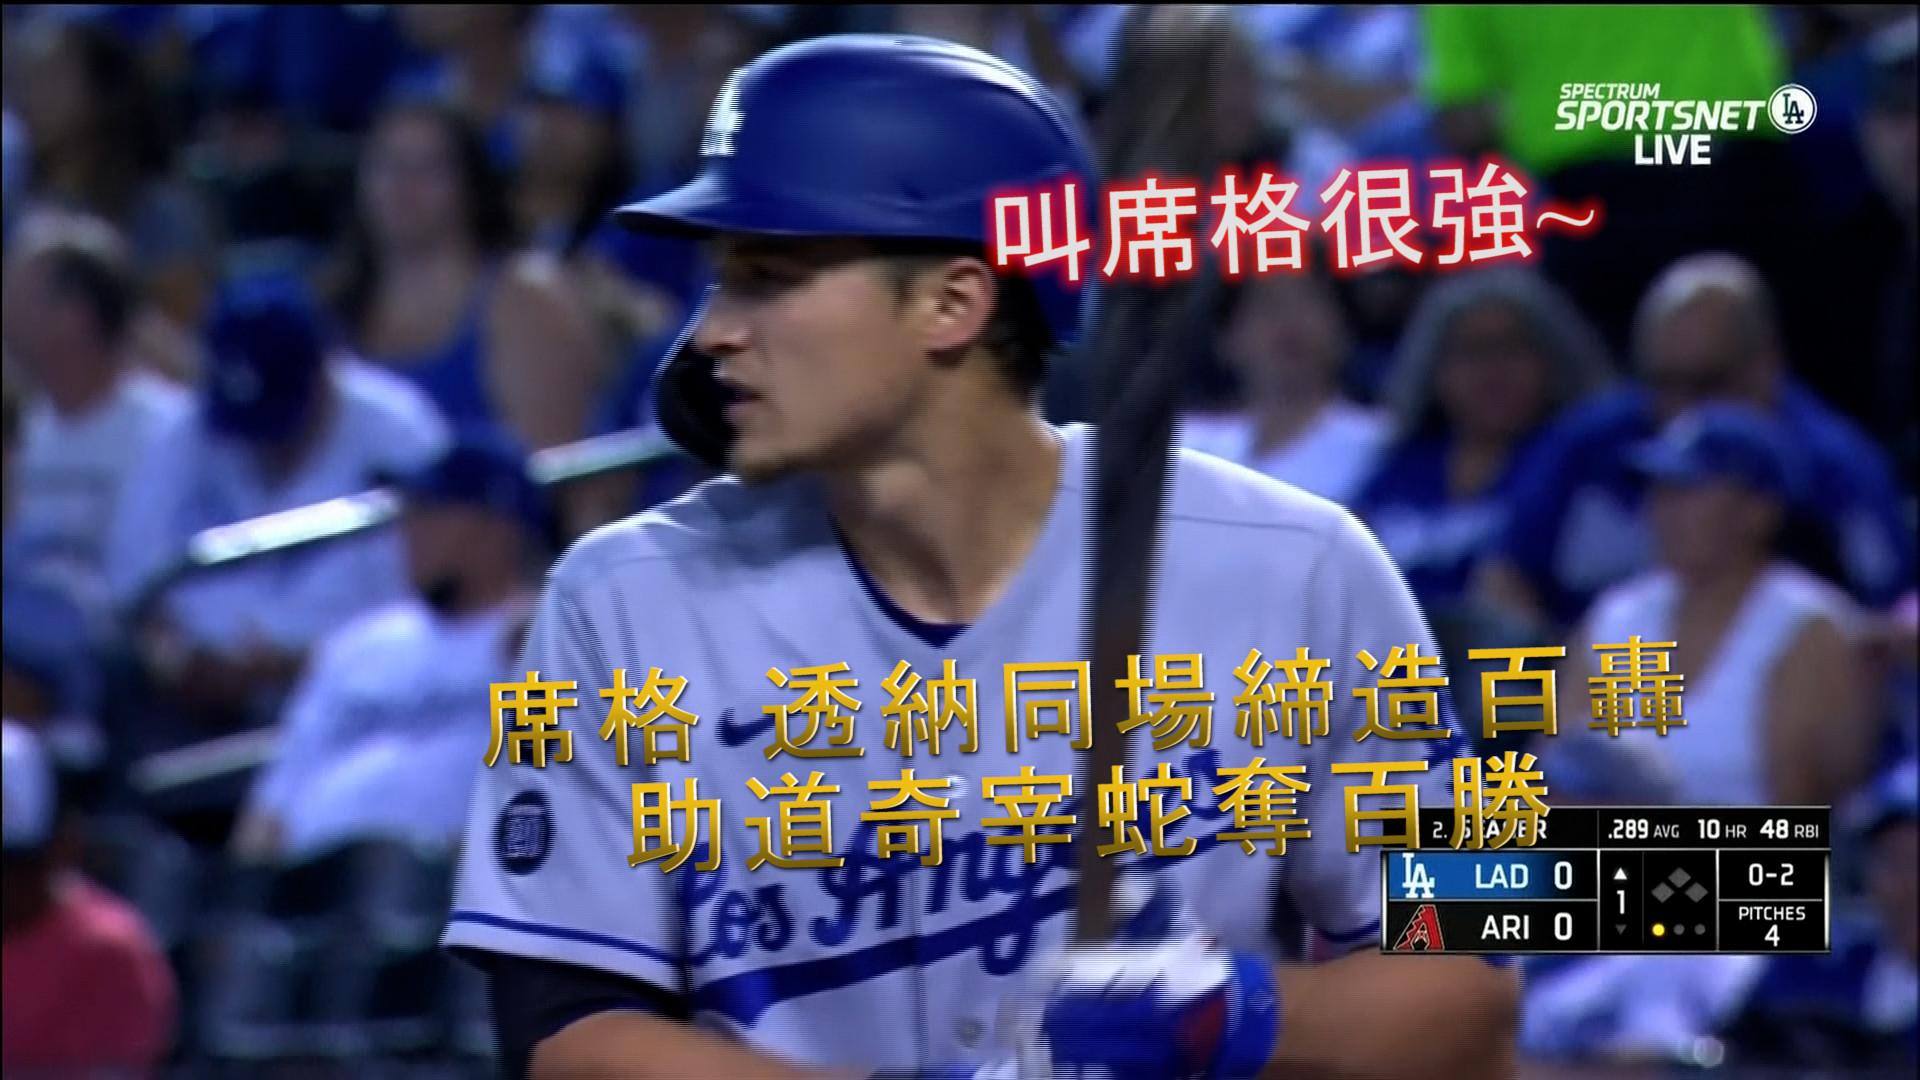 【MLB看愛爾達】道奇賺「三百」爽贏 宰蛇奪本季百勝 9/27